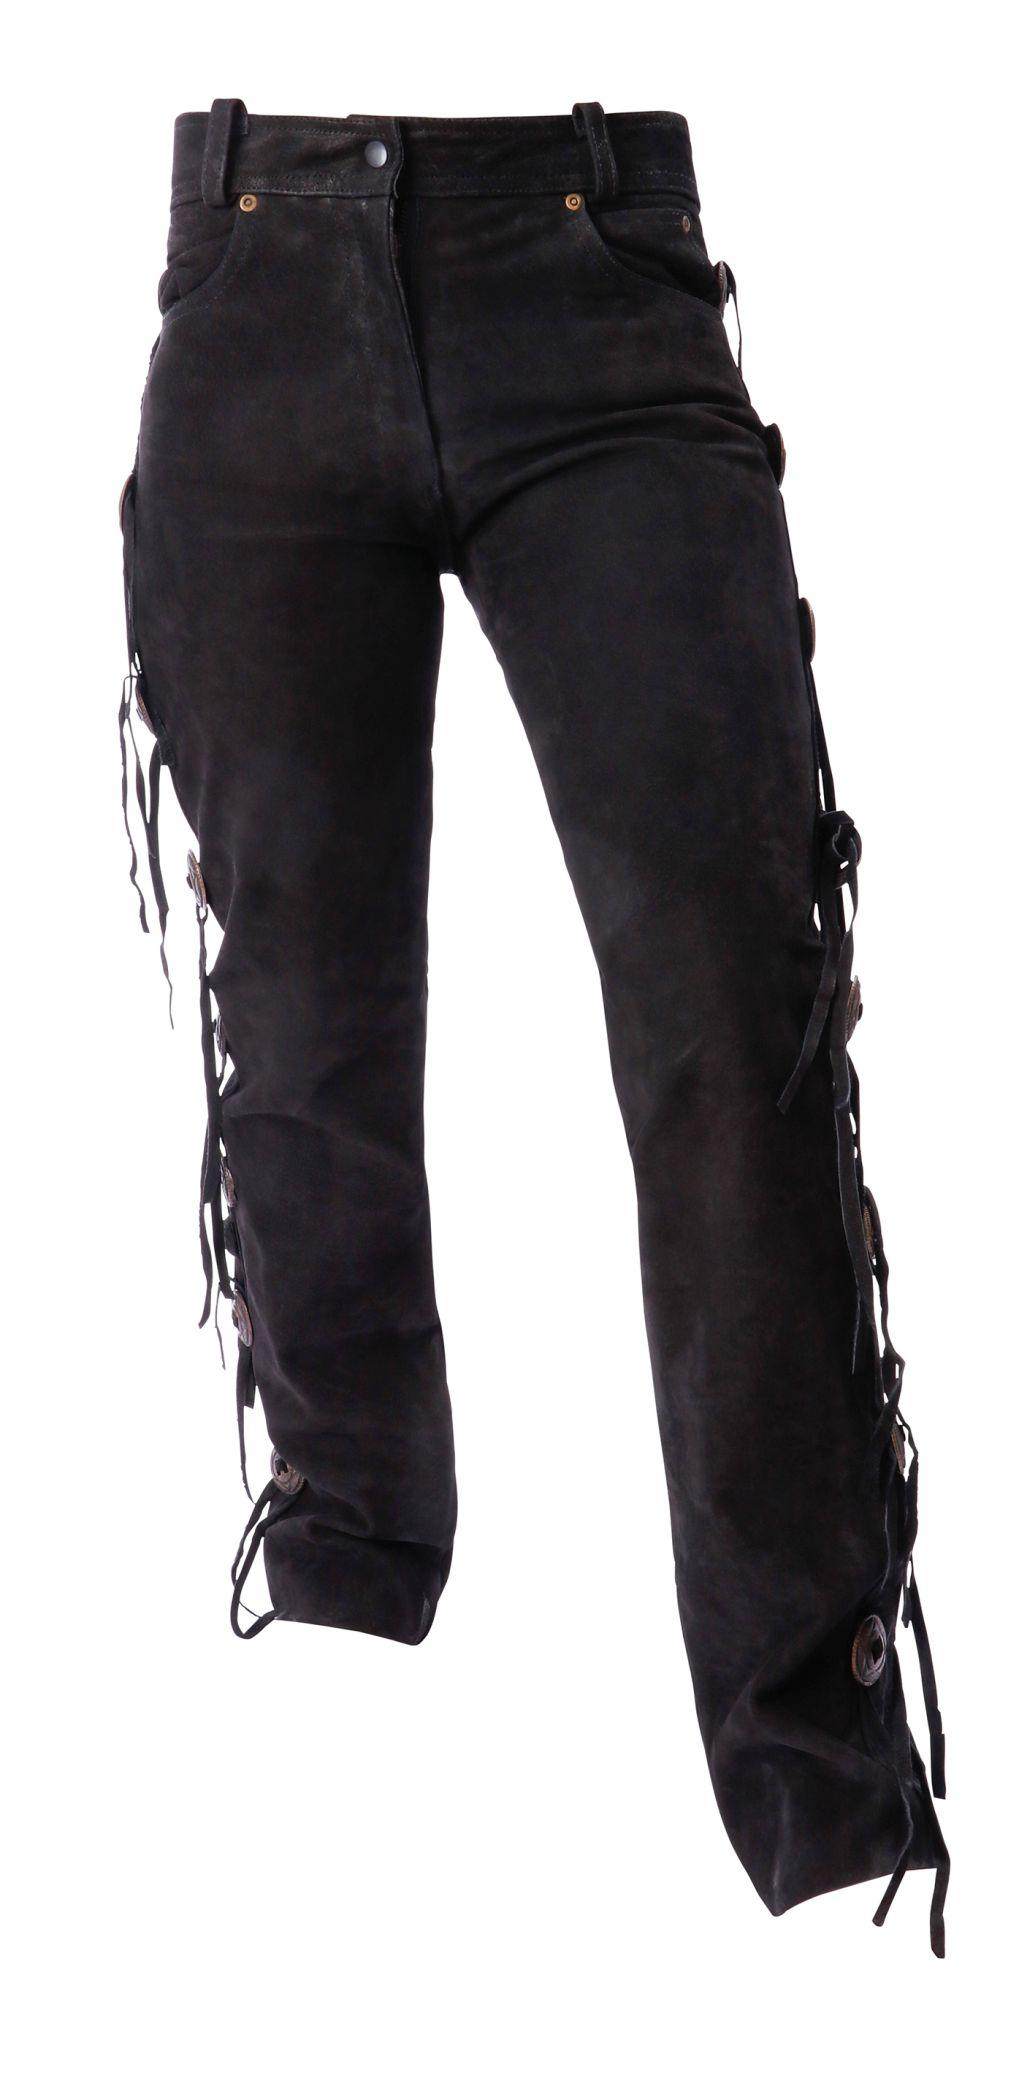 Damen Jeans Conchos Lederhose Westernreiten Motorrad Schwarz 29-32 inch